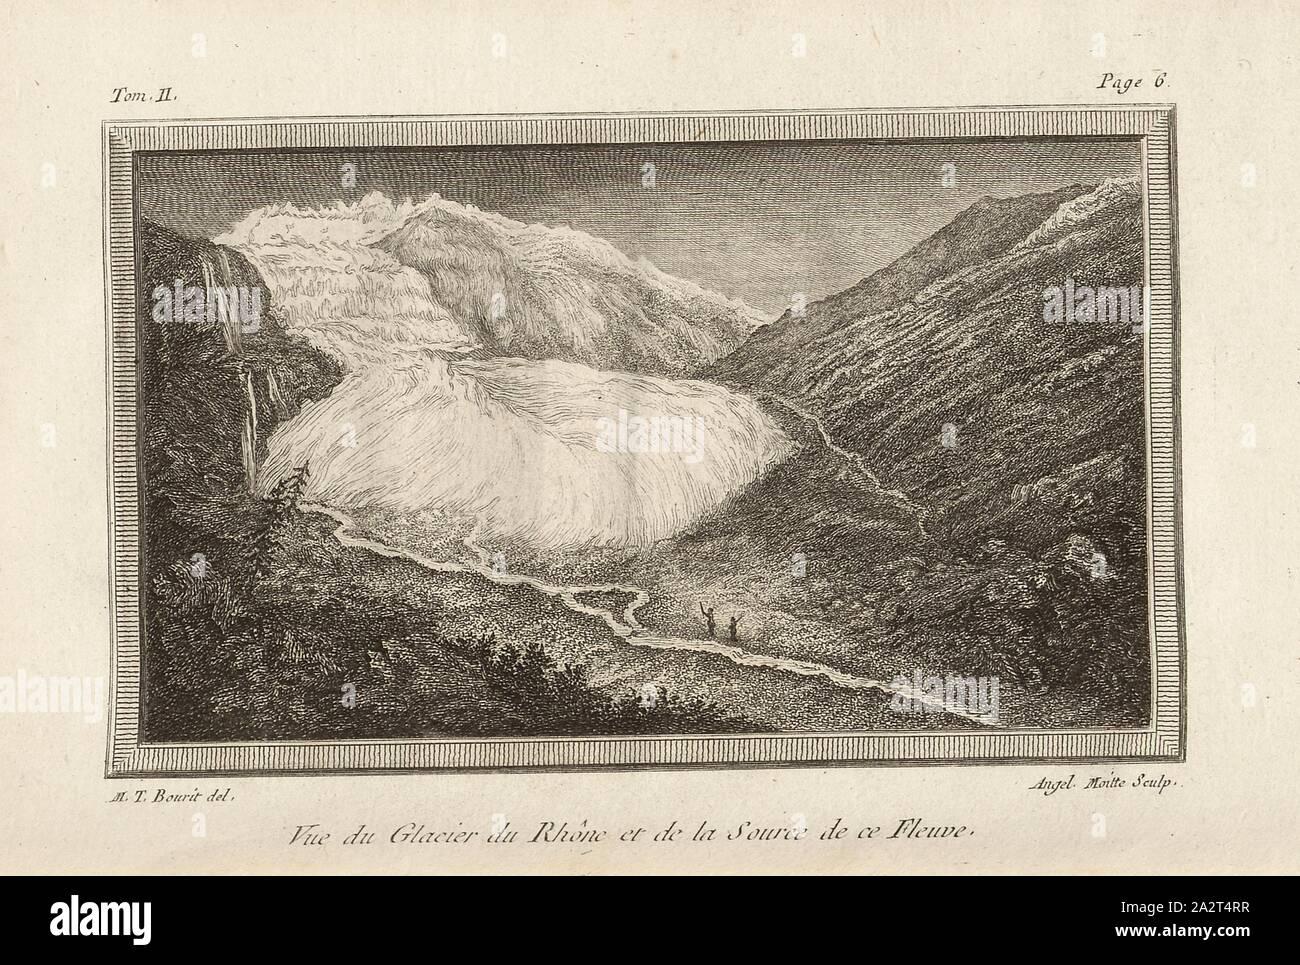 View of the Rhone Glacier and the Source of this River, View of the Rhone glacier, Signed: M. T. Bourit, Angel., Moitte, etching, plate 1, p. 6 (Vol. 2), Bourrit, Marc-Théodore (del.); Moitte, Angélique-Rose (sculp.), 1883, Bourrit, Marc-Théodore, Nouvelle description des Alpes. Genève: chez Paul Barde, 1783 Stock Photo